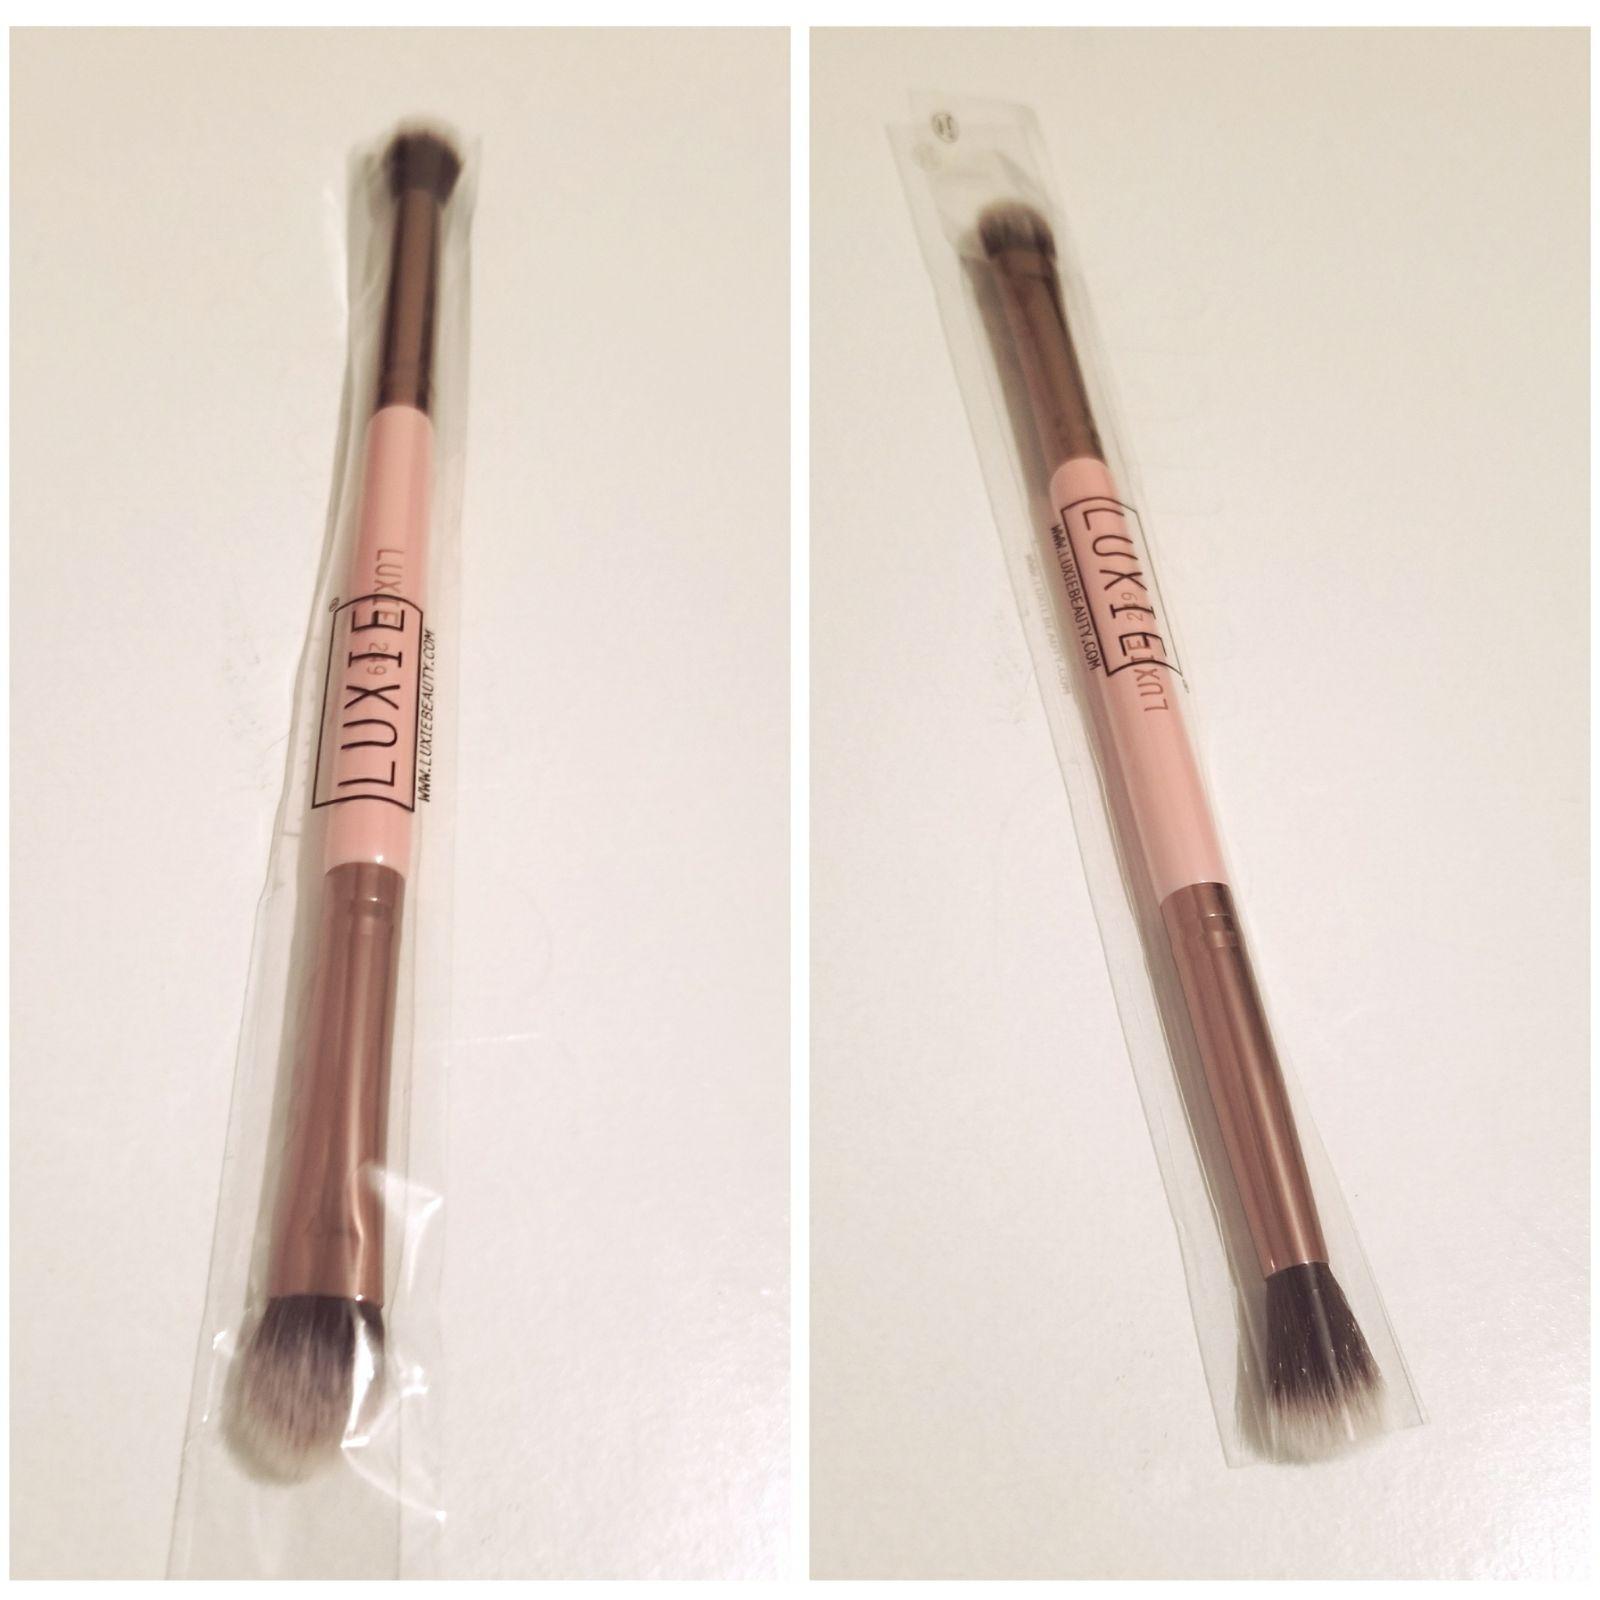 Luxie Beauty Eye Brush 249